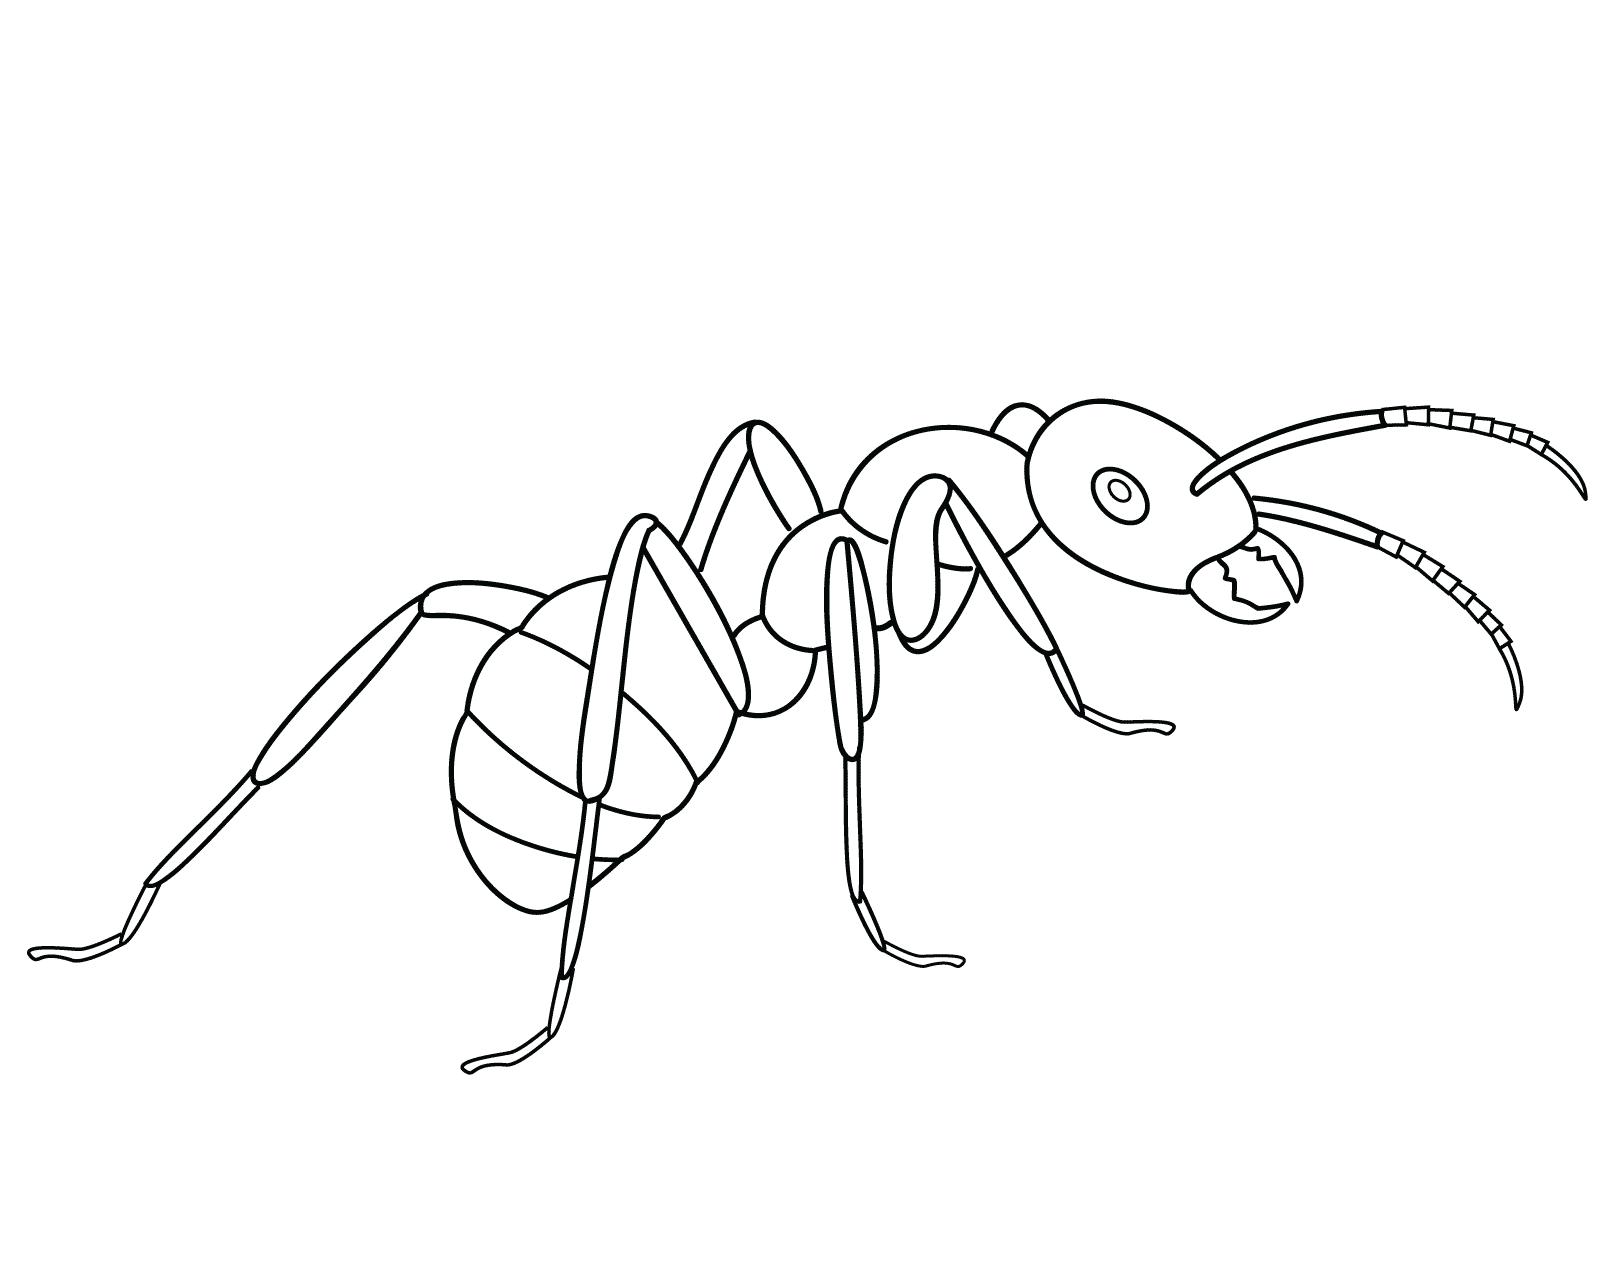 Черно-белая картинка муравей